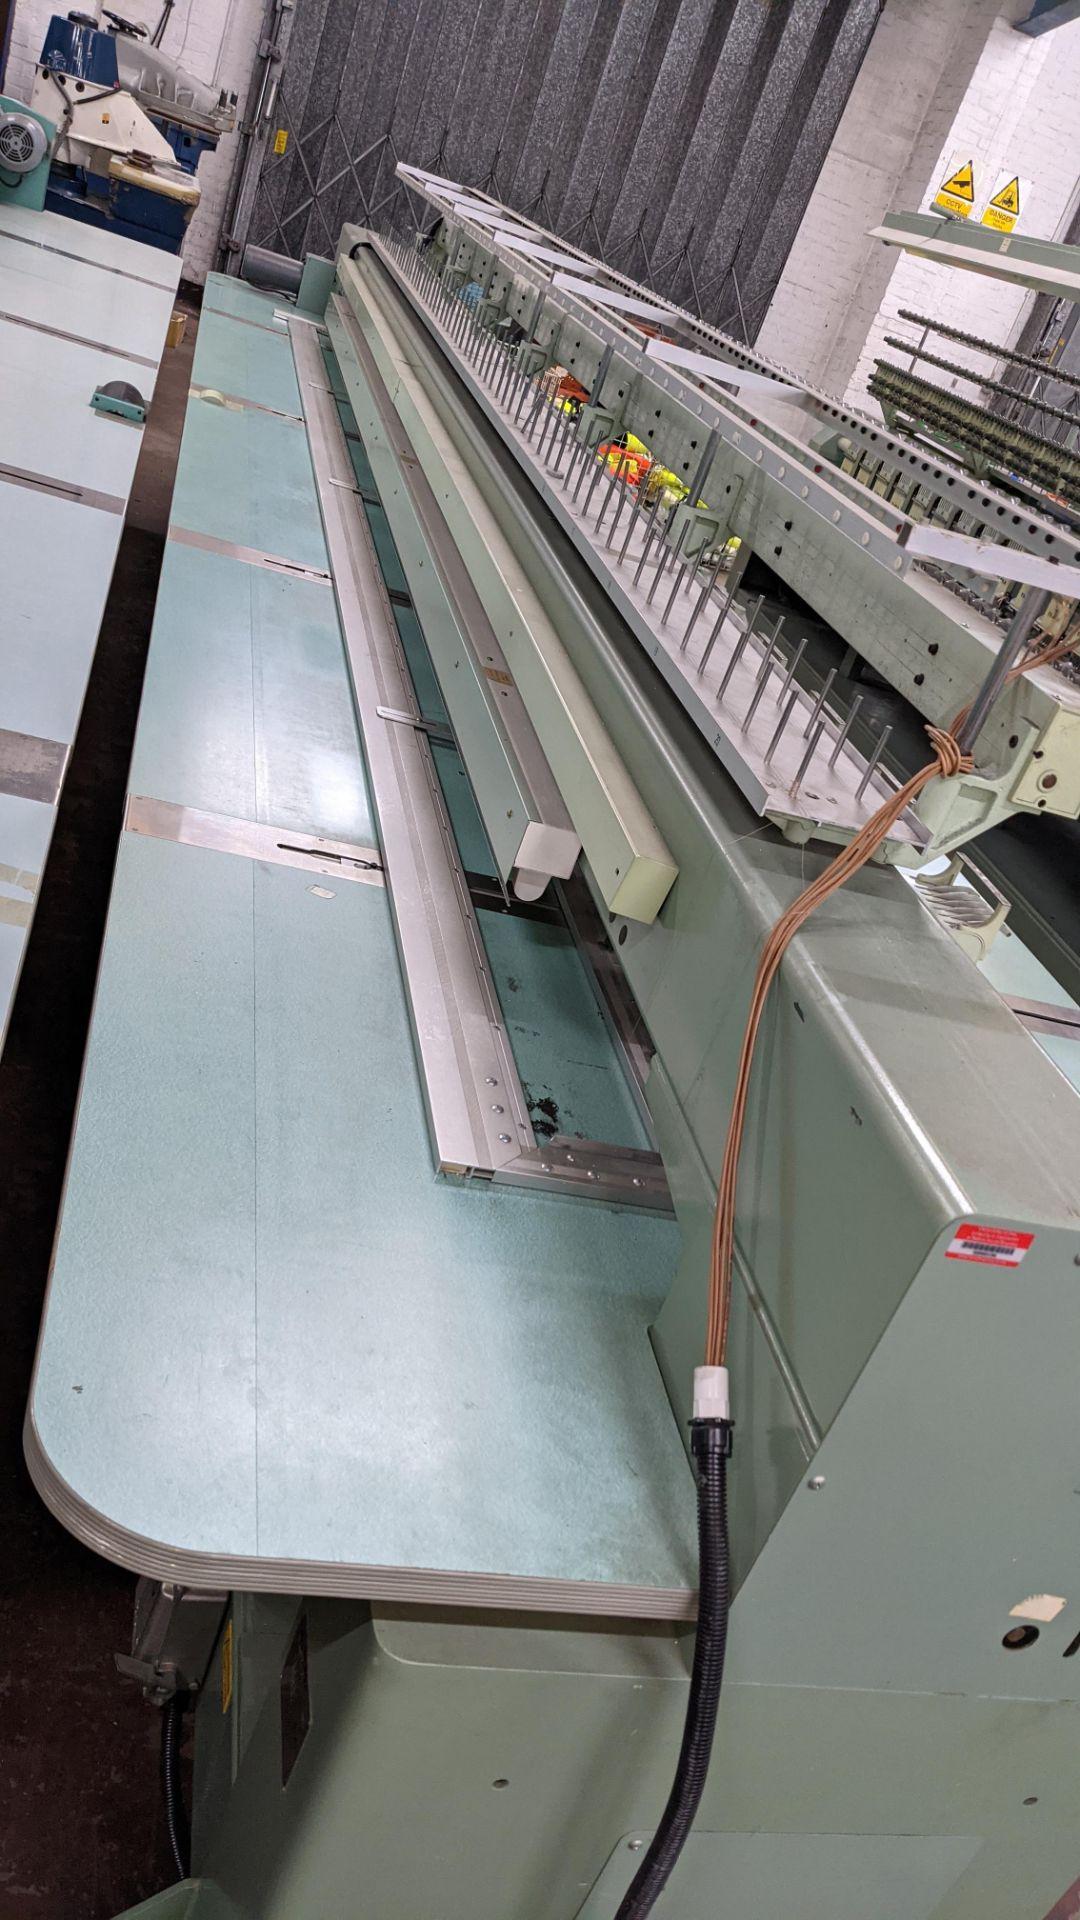 Tokai Tajima electronic 20 head automatic embroidery machine model TMEG-G620, manufacturing number 7 - Image 8 of 19